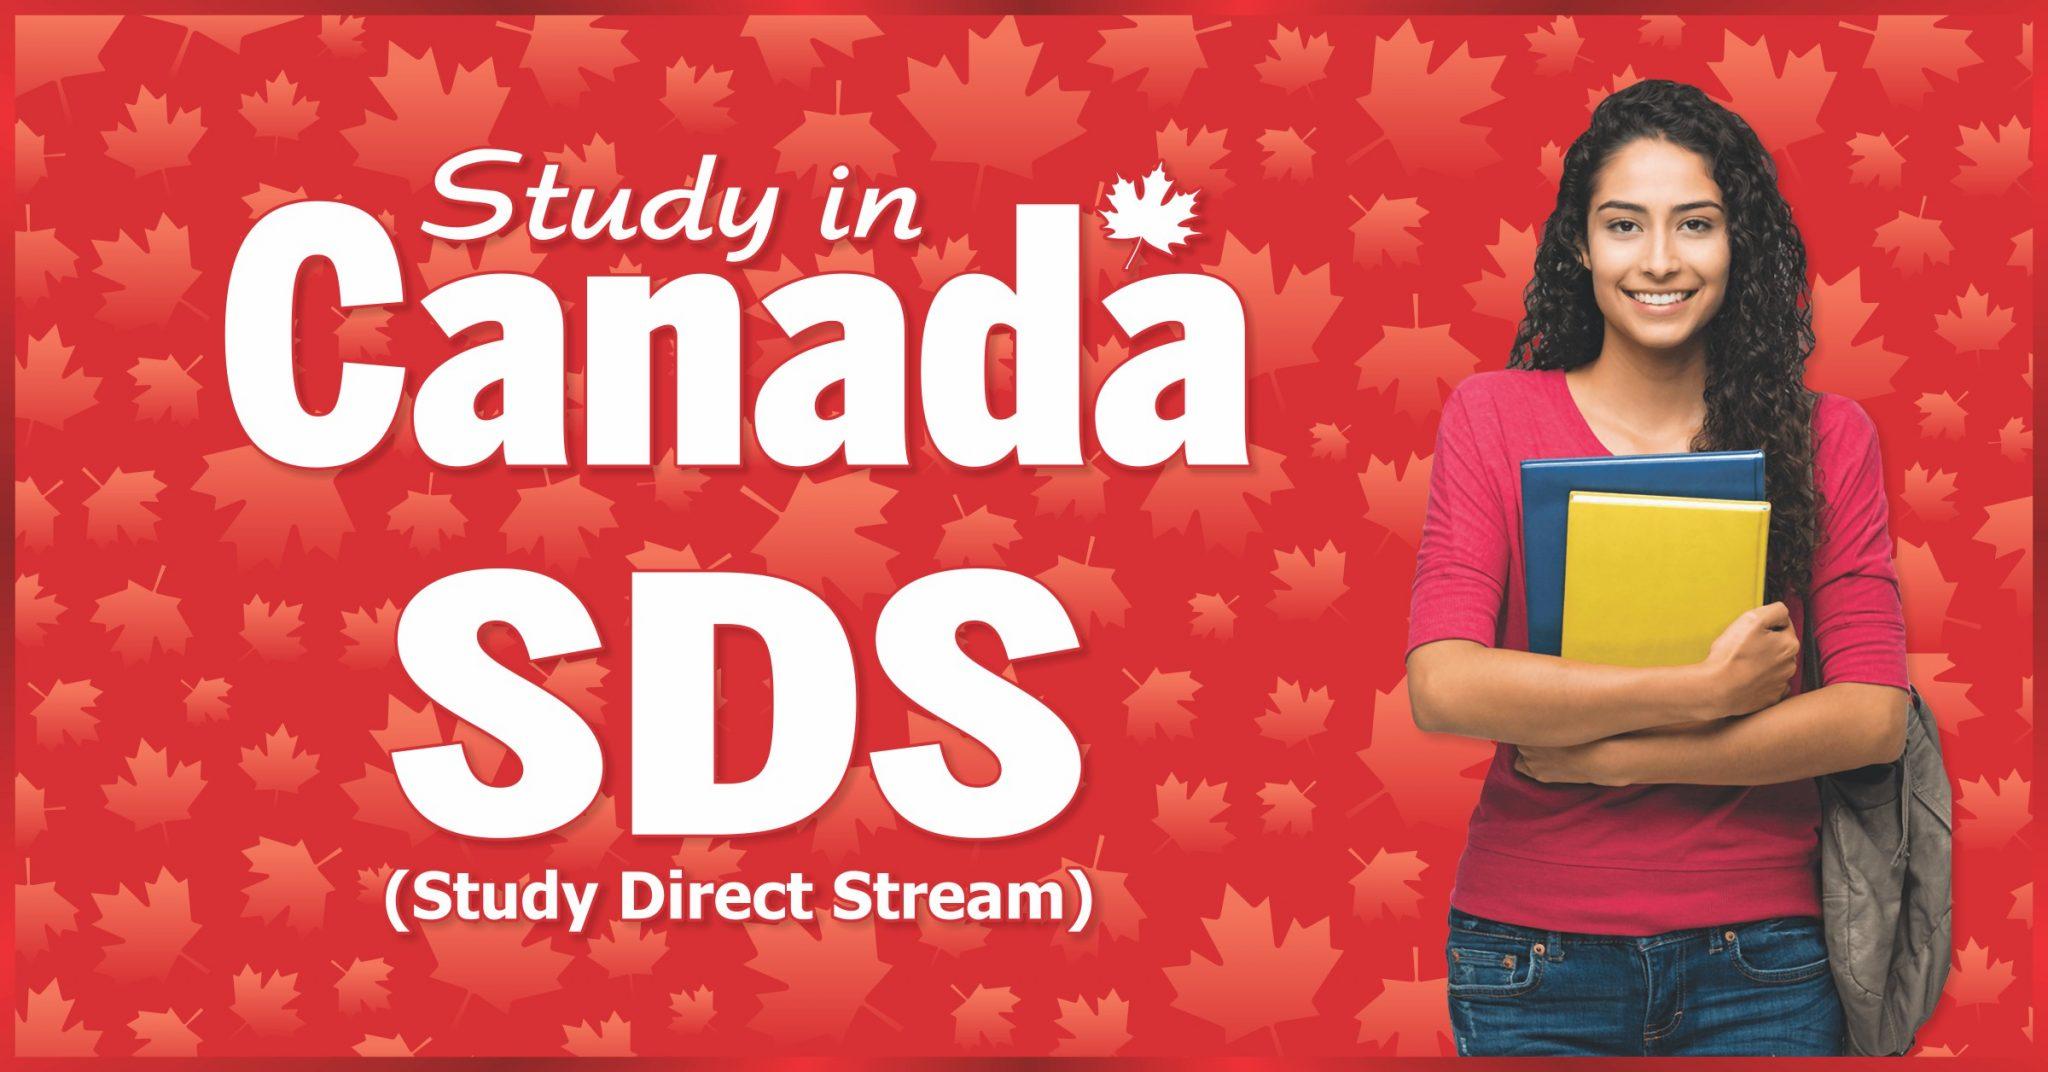 Canada Offers New Study Direct Stream Program